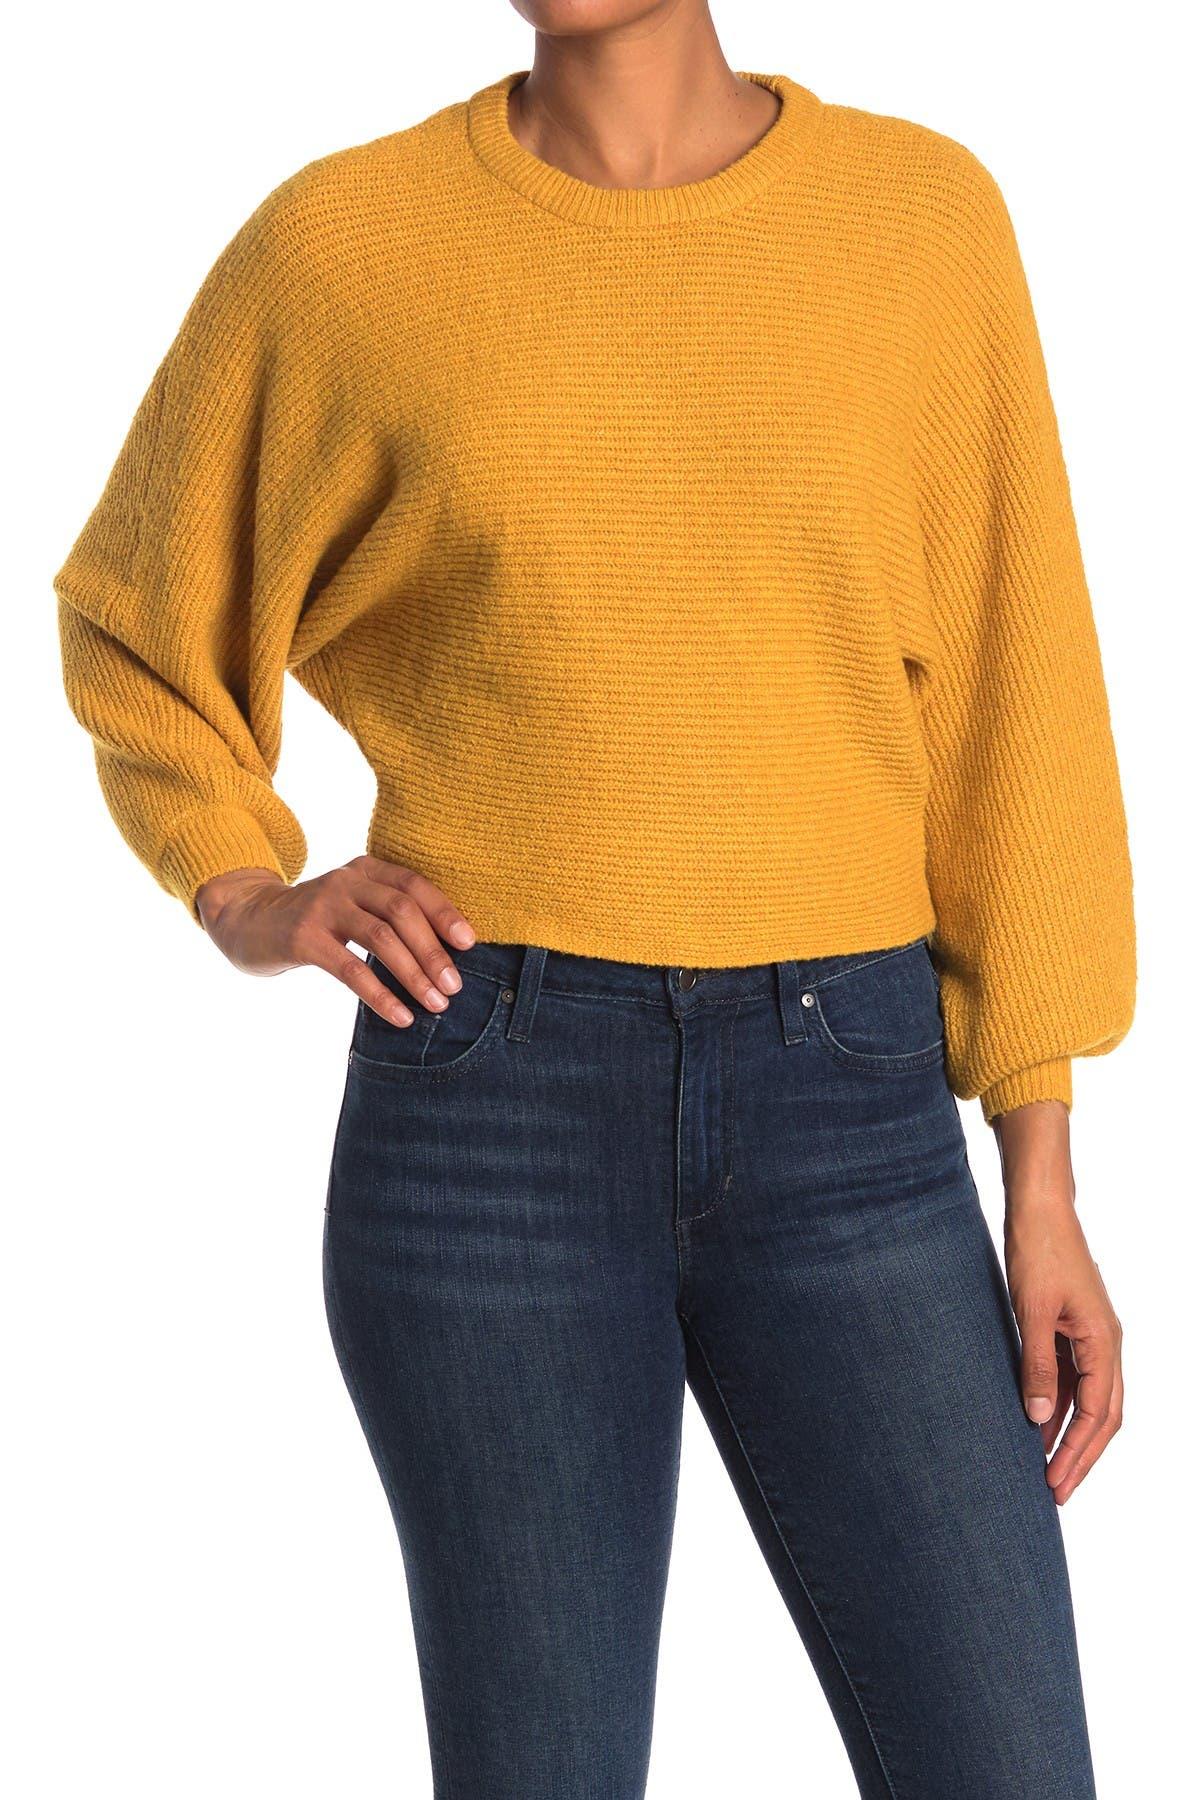 Image of Elodie Crew Neck Balloon Sleeve Sweater